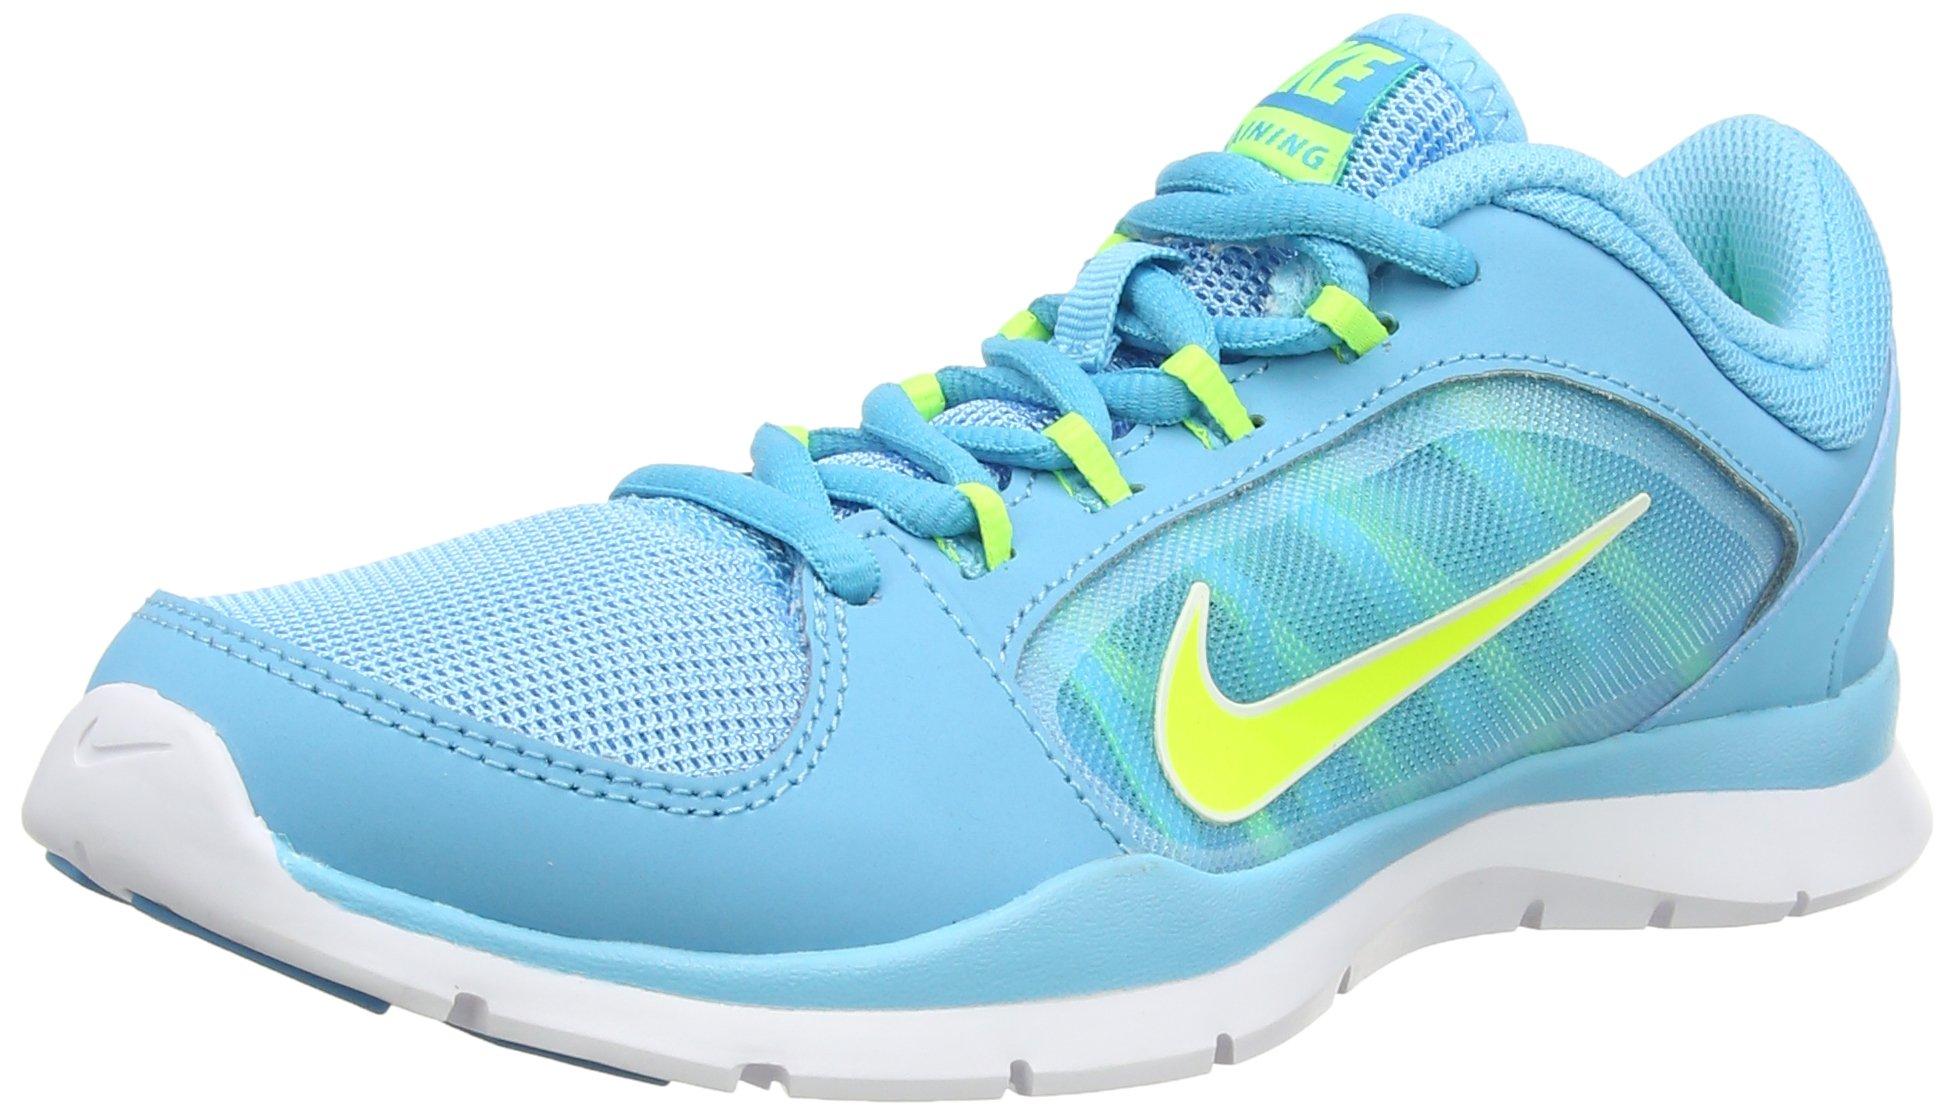 NIKE Women's Flex Trainer 4 Clearwater/Volt/Bl Lgn/White Training Shoe 6.5 Women US